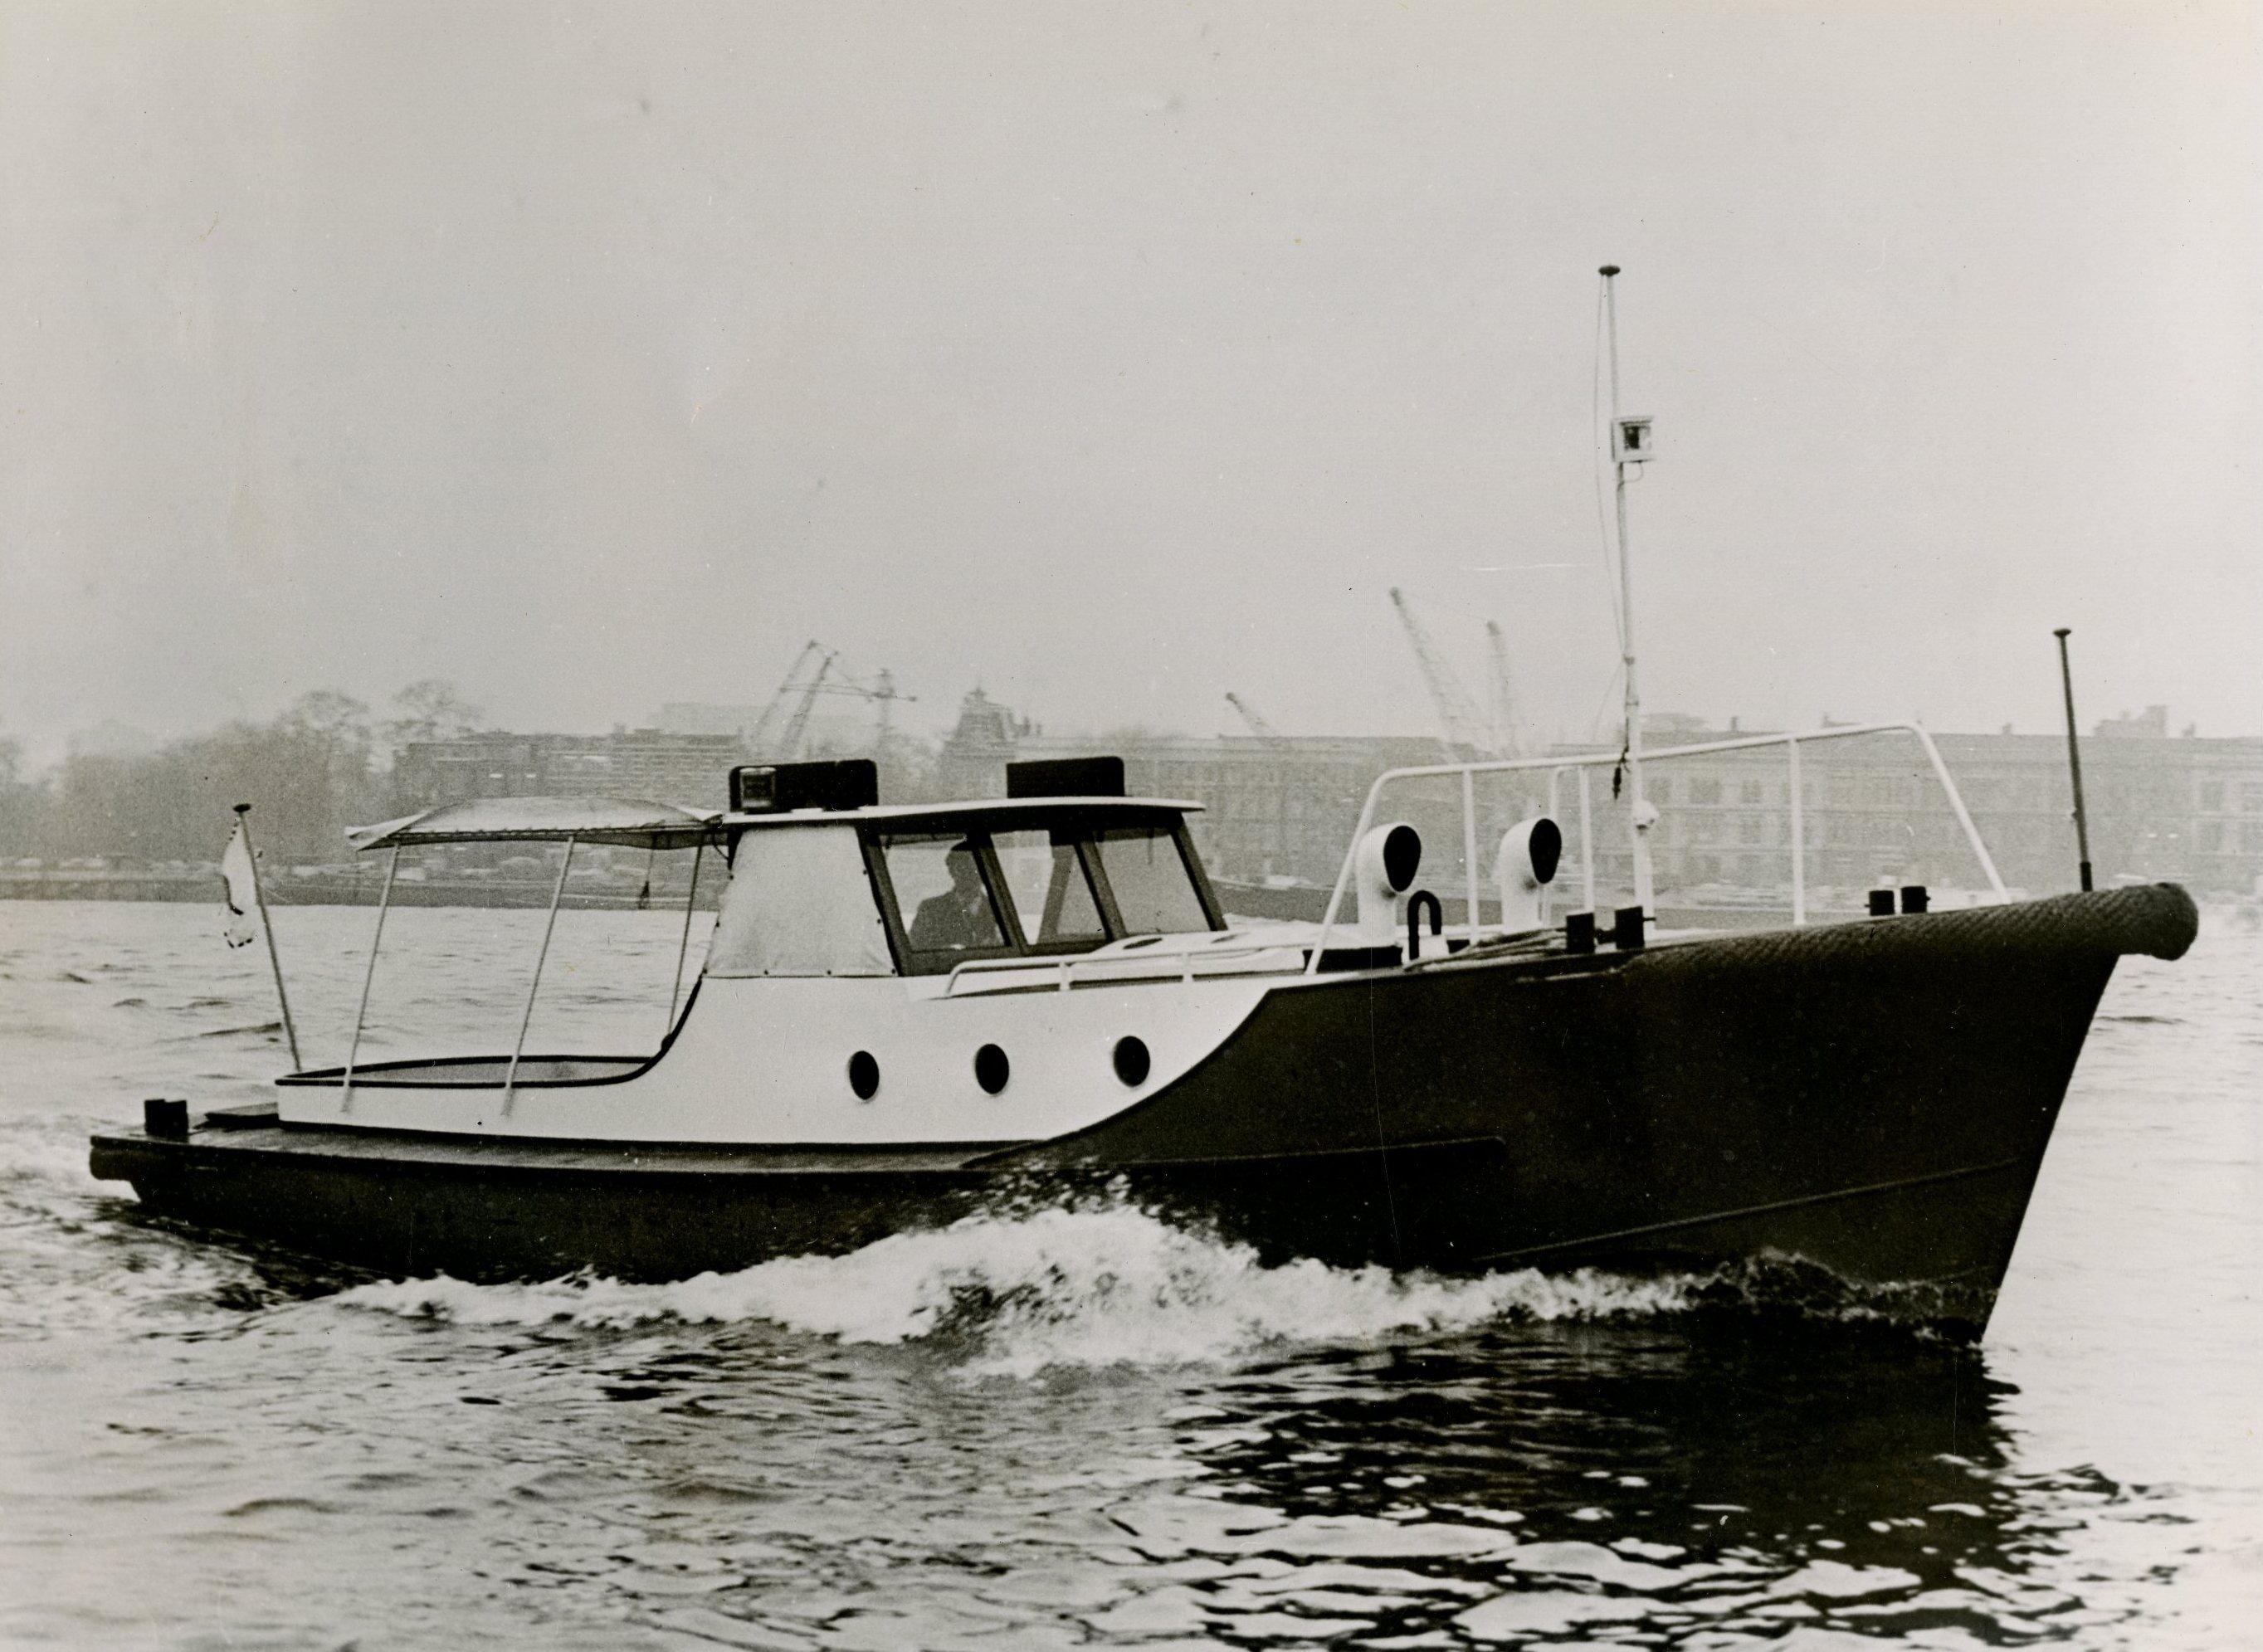 Bnr. 404 Dienstboot (1960)